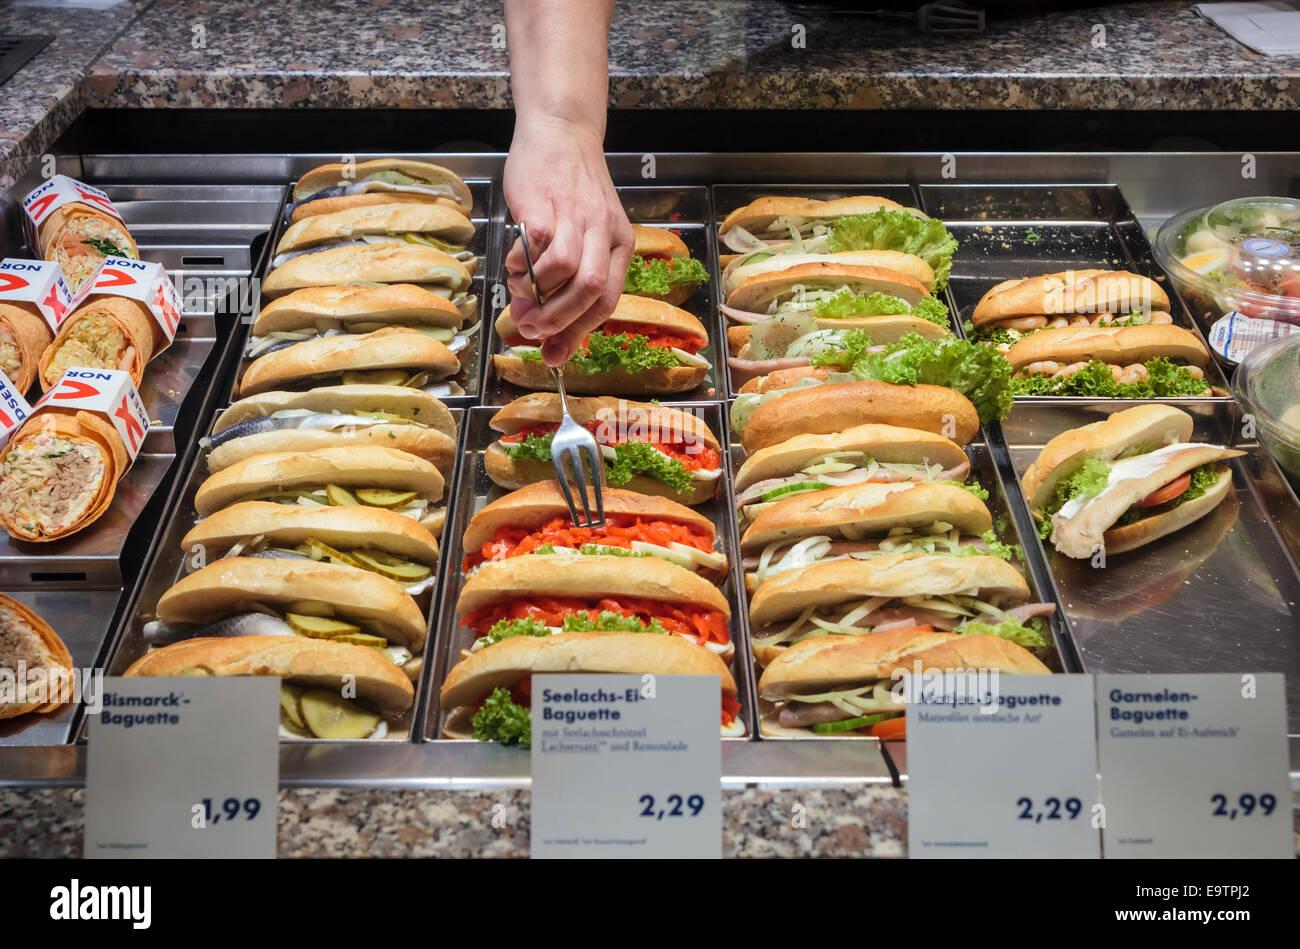 Healthy Fast Food Germany